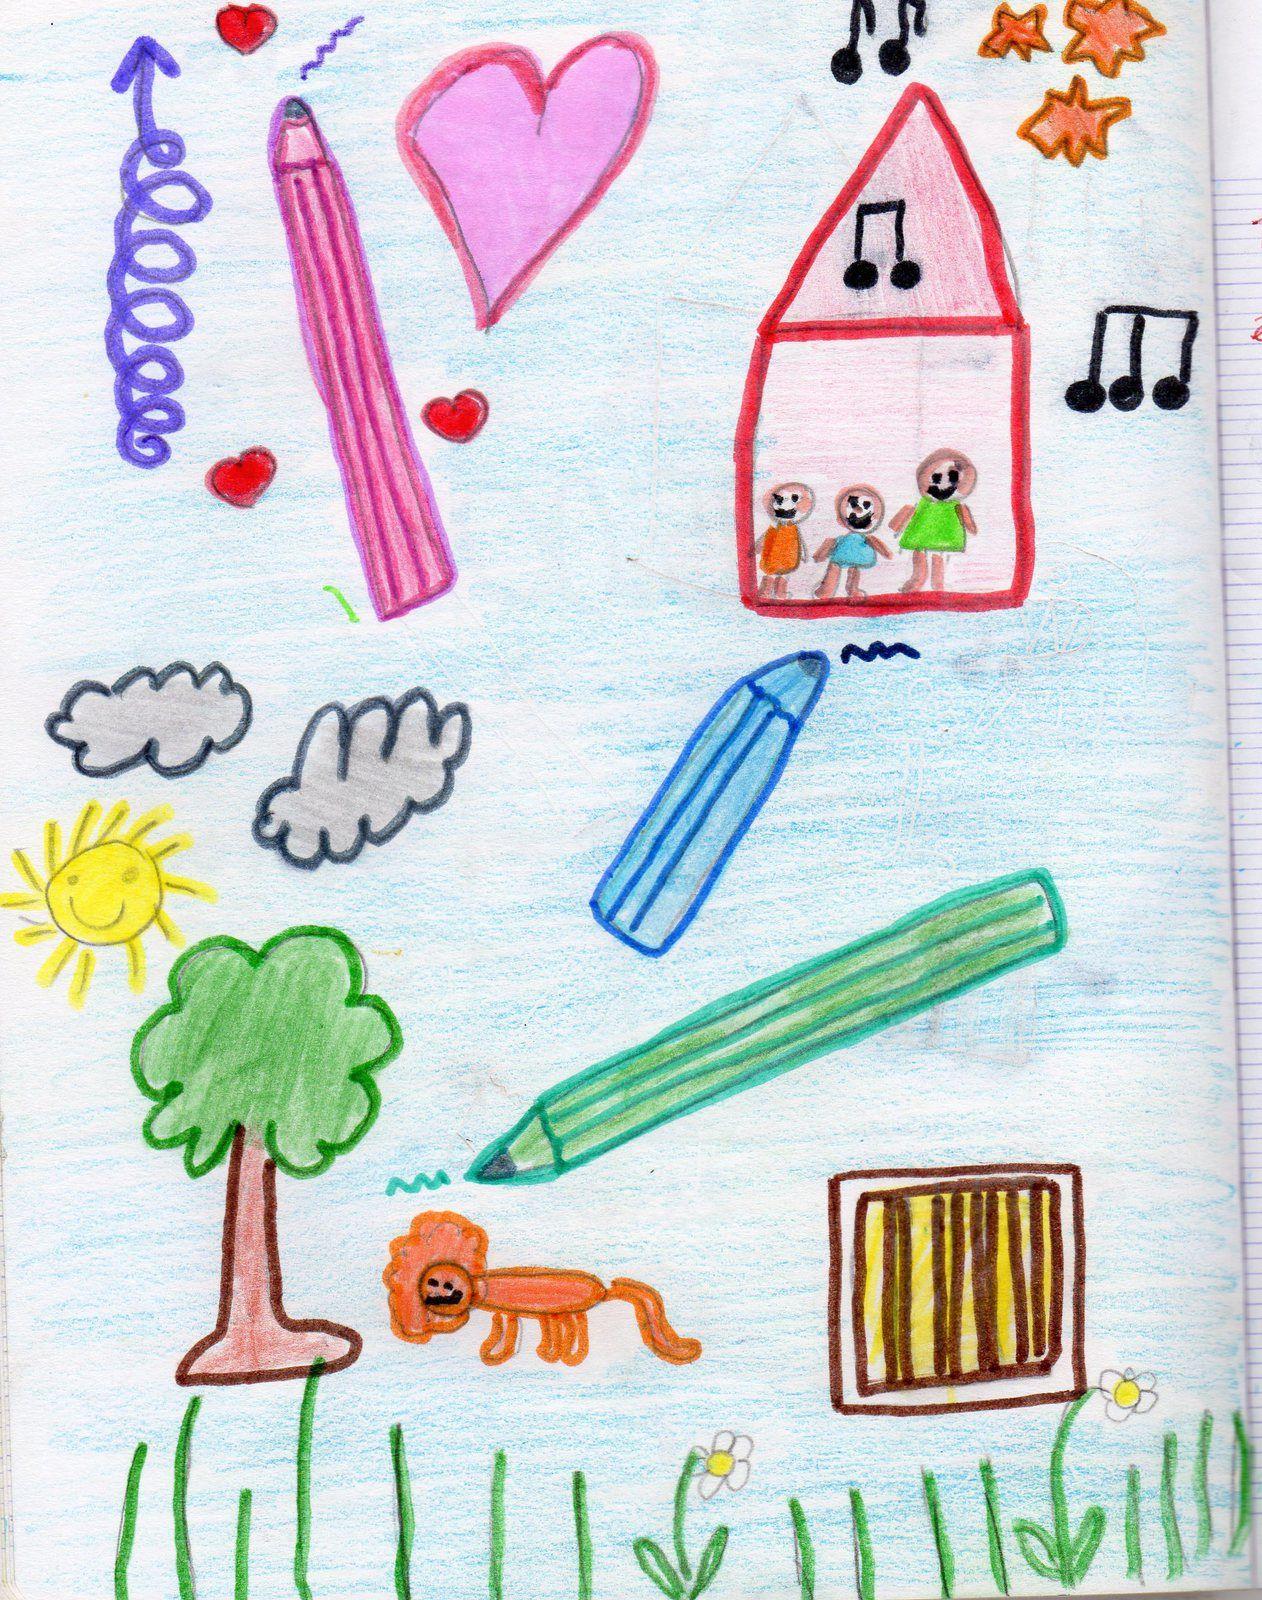 Illustré par Adèle, Charly, Lohan, Paul B.B. ,